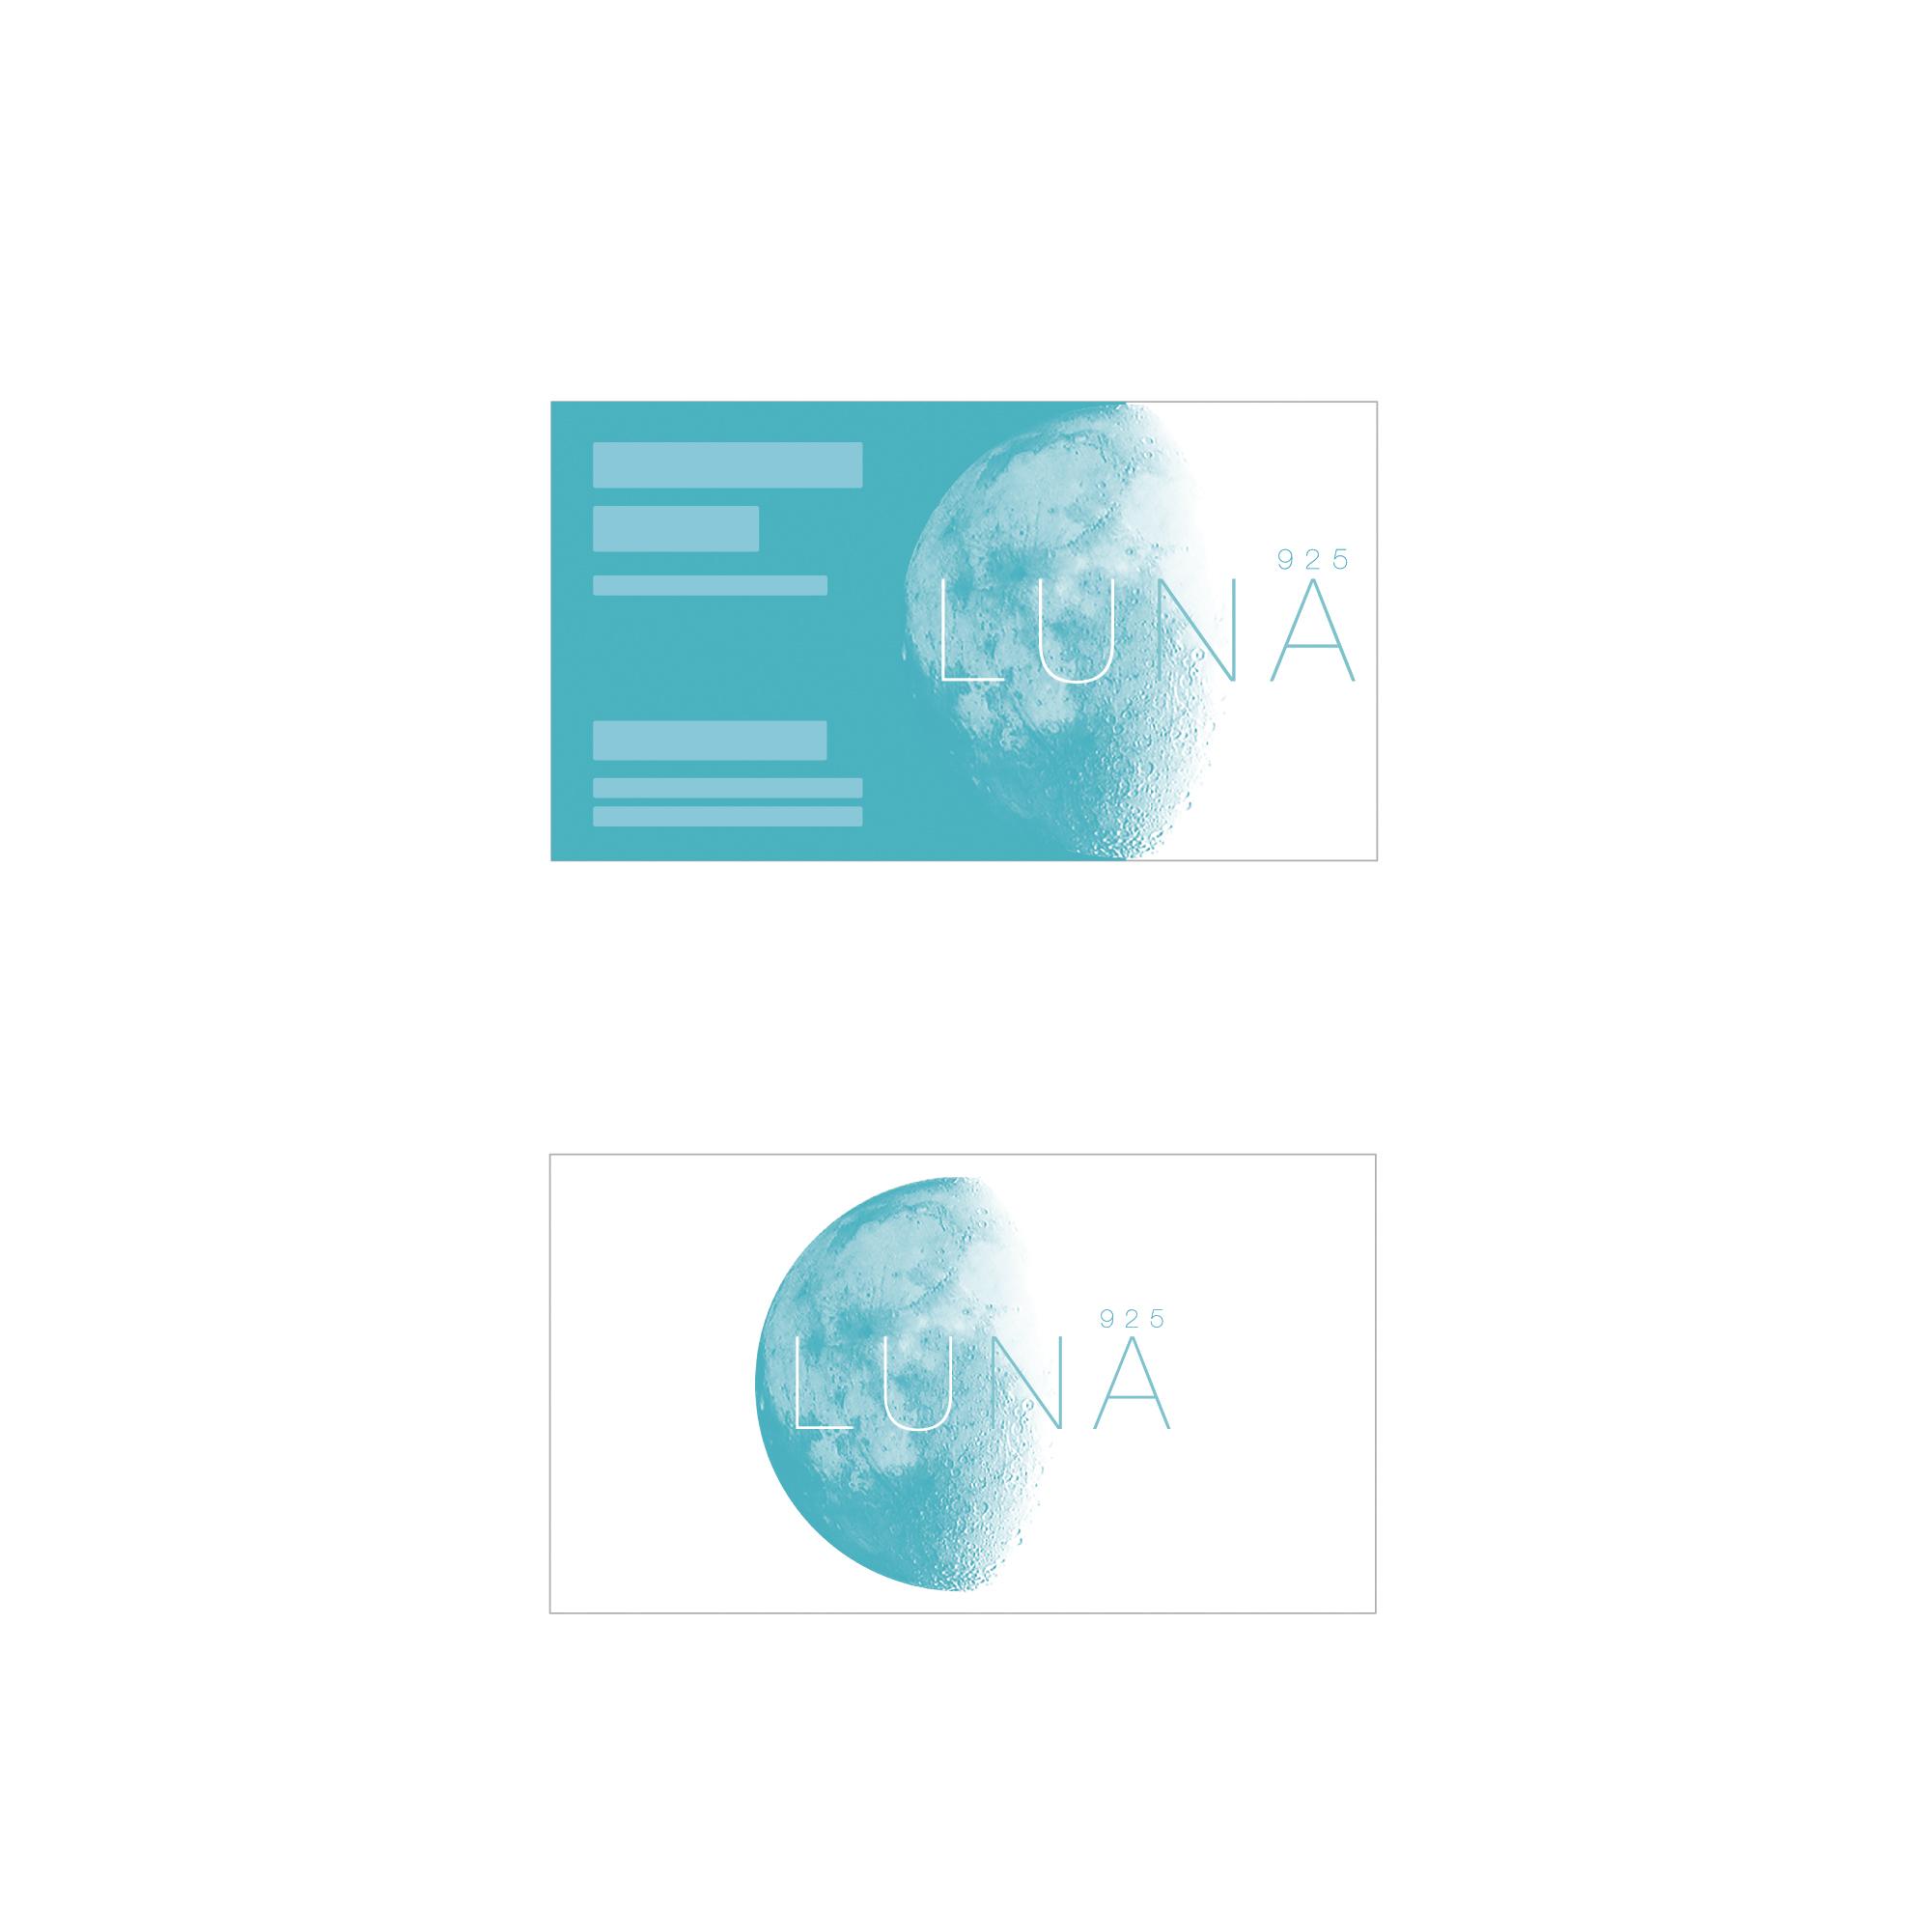 Логотип для столового серебра и посуды из серебра фото f_9145bab7979bc270.jpg